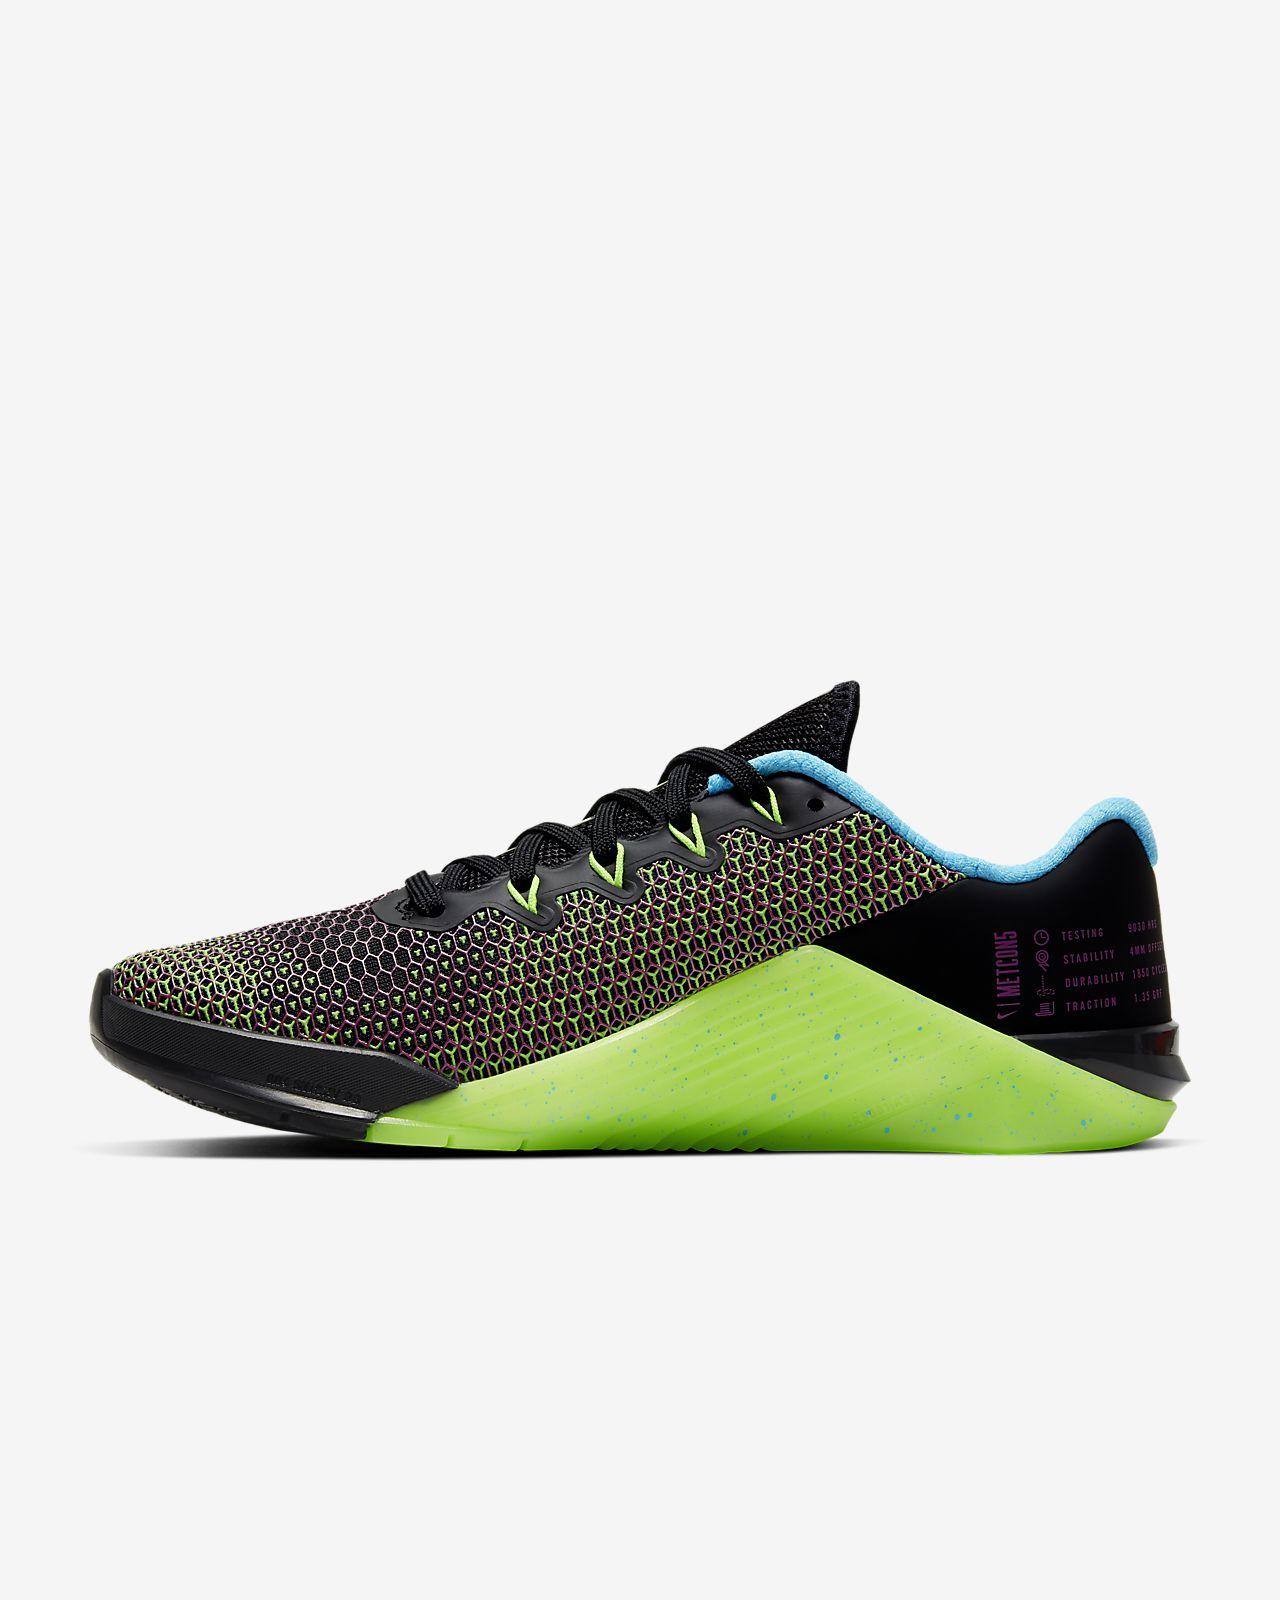 Nike Metcon 5 AMP Women's Training Shoe